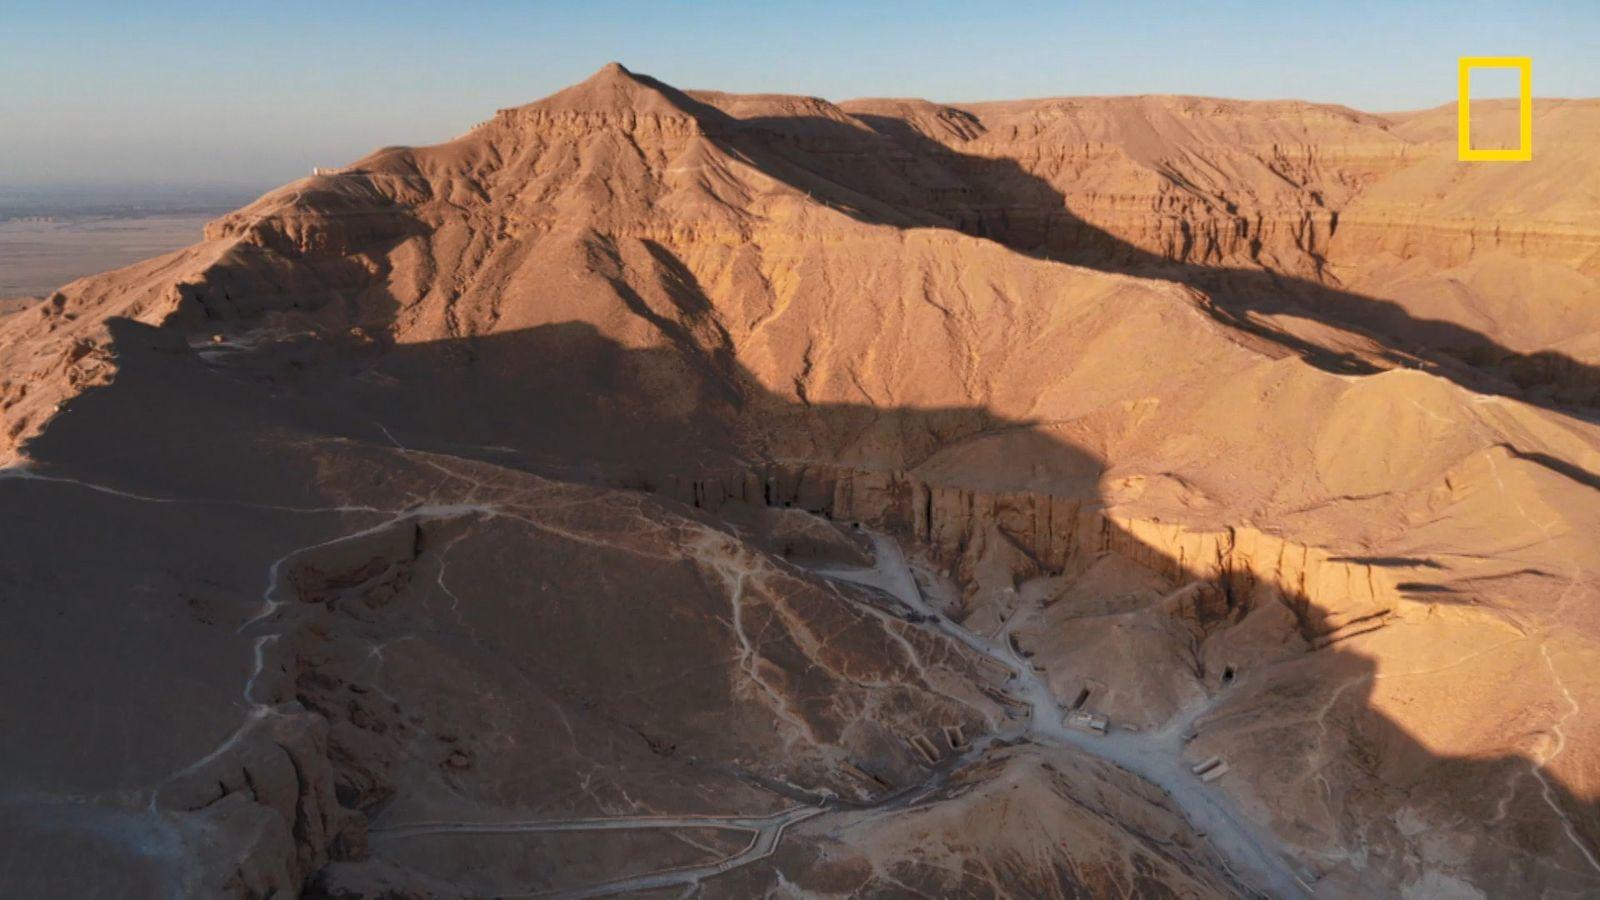 La nécropole secrète des pharaons